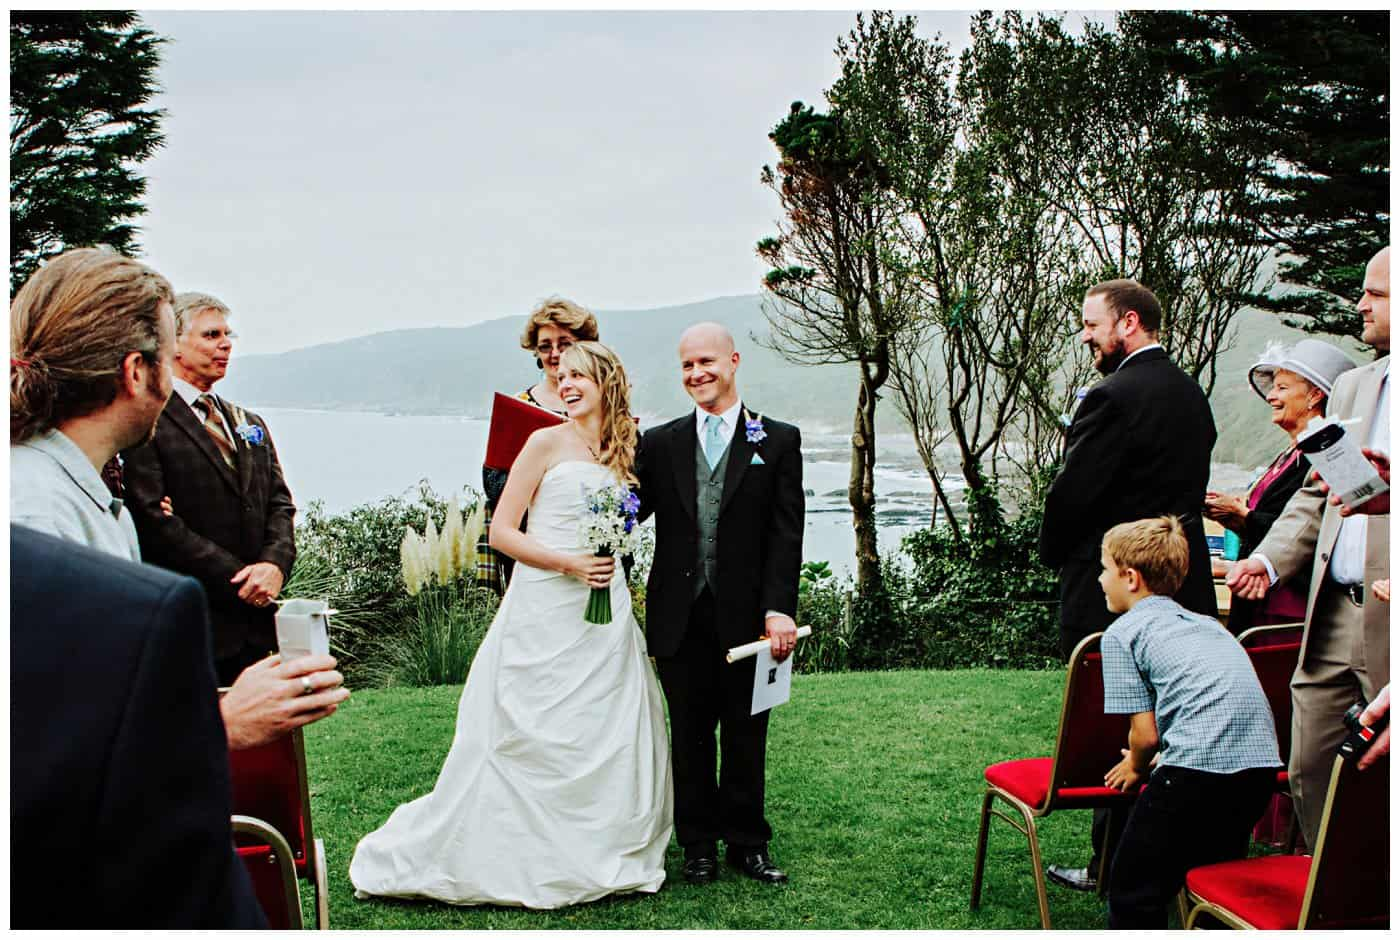 Steve Gerrard wedding